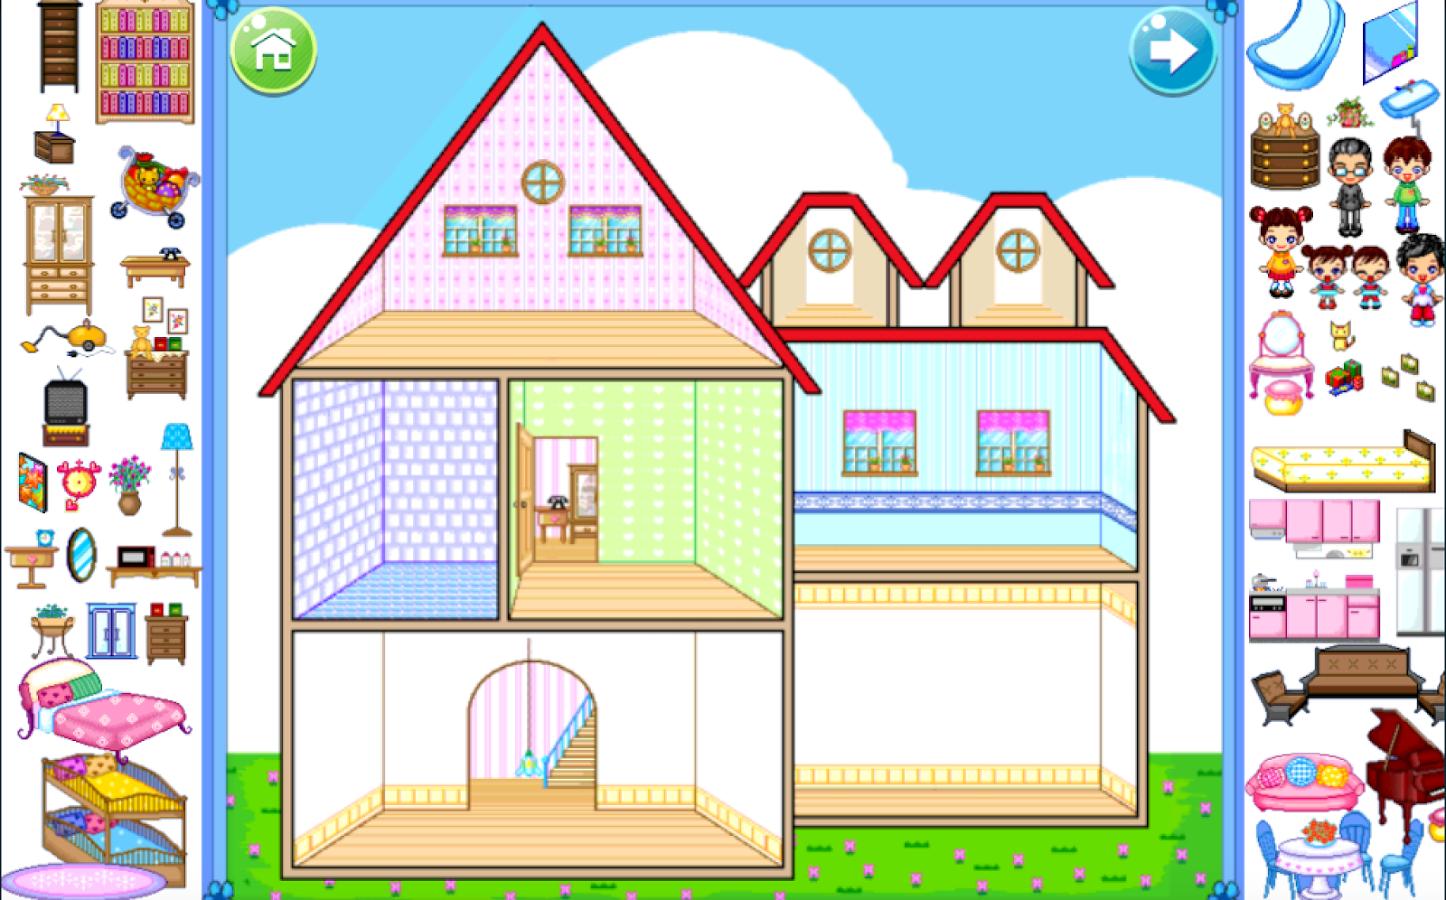 Dreaming clipart dream house #4